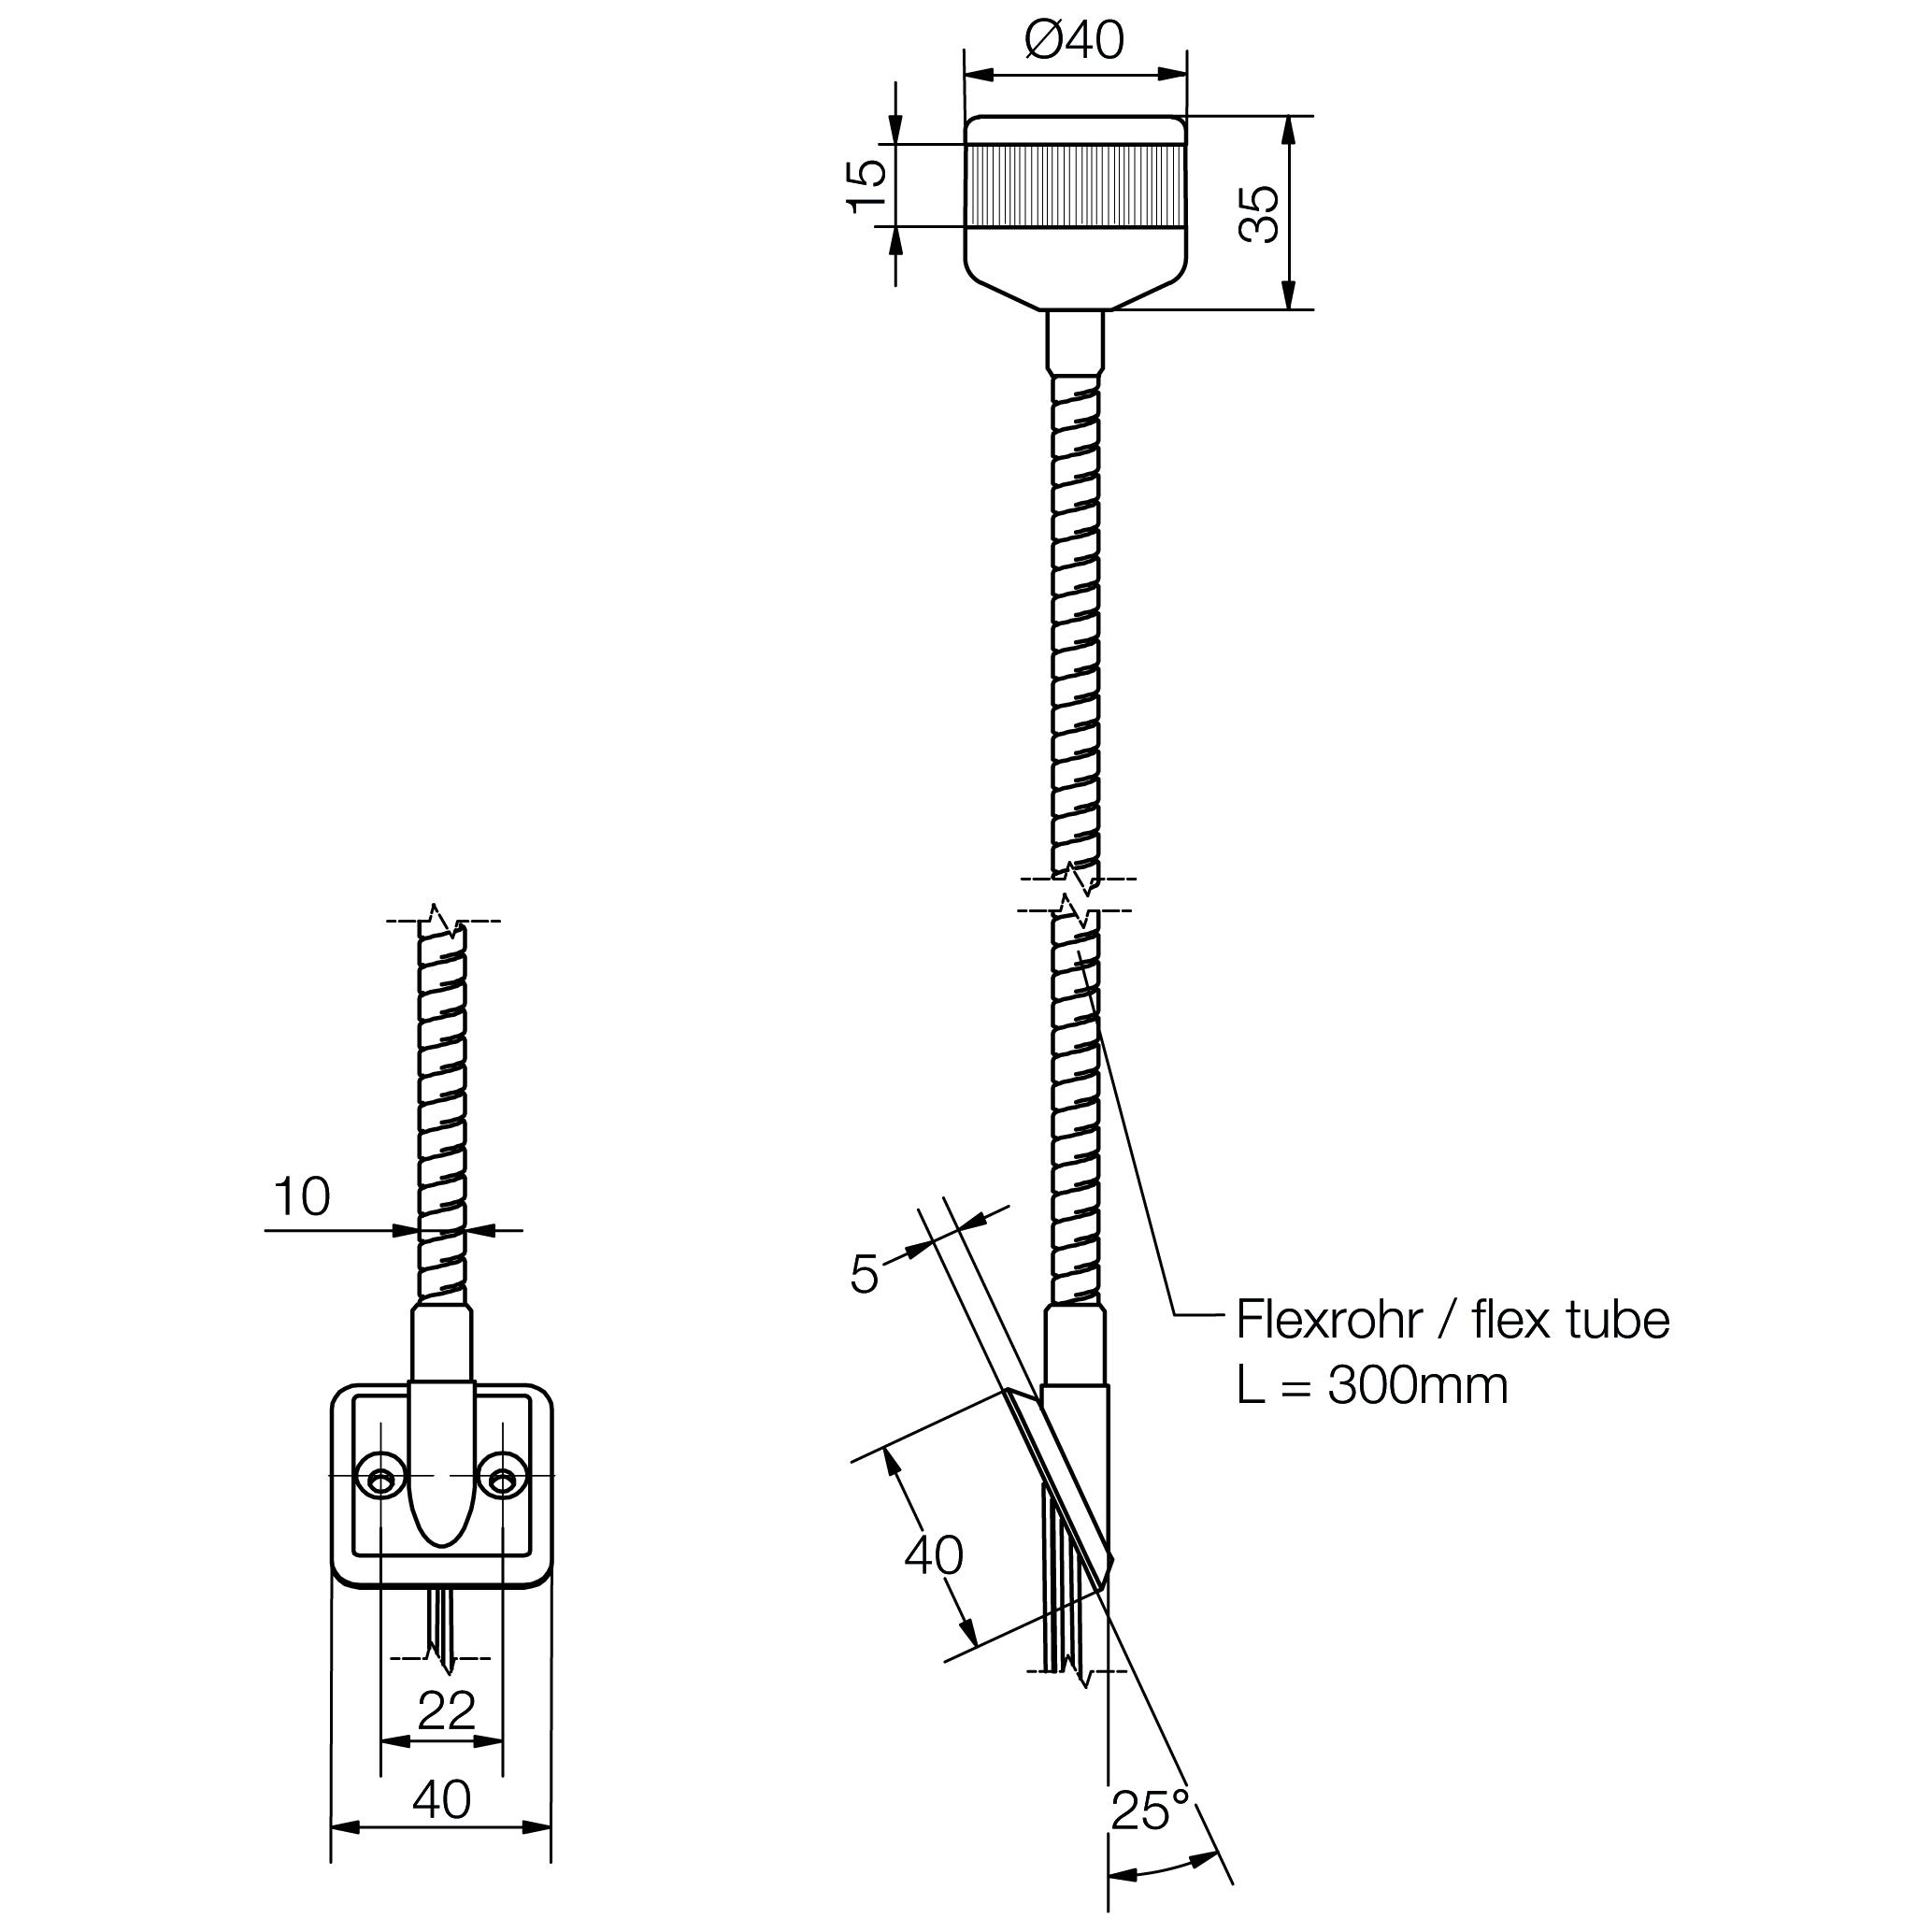 LED-Kompakt-Towerlampe mit Befestigungs-Flansch - plan